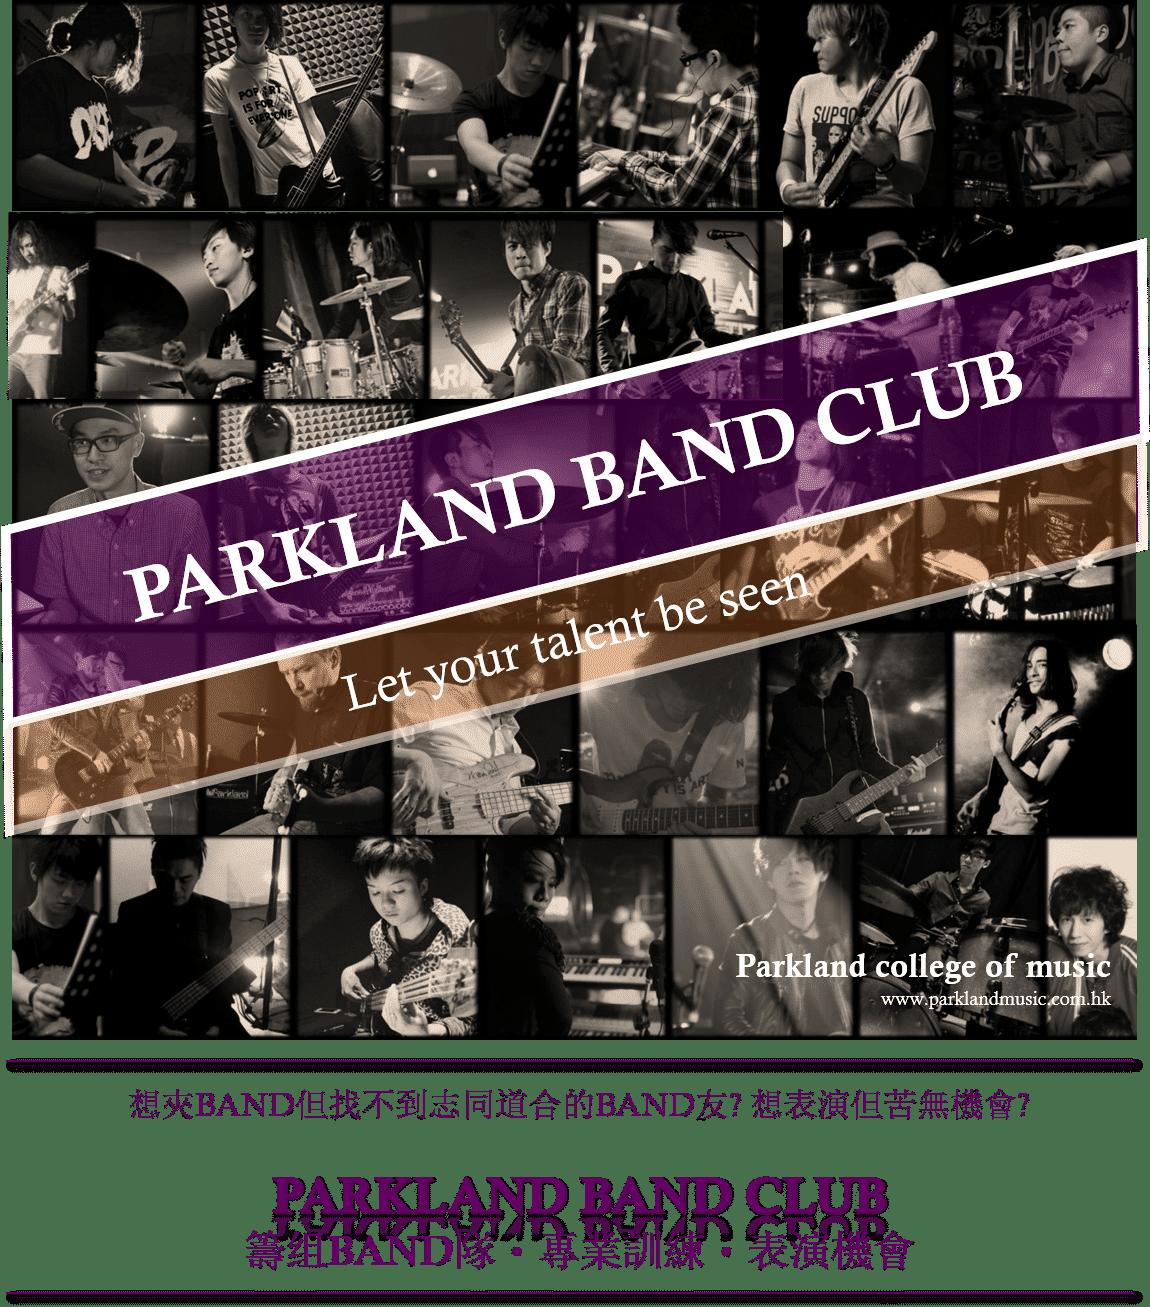 parkland_bandclub1